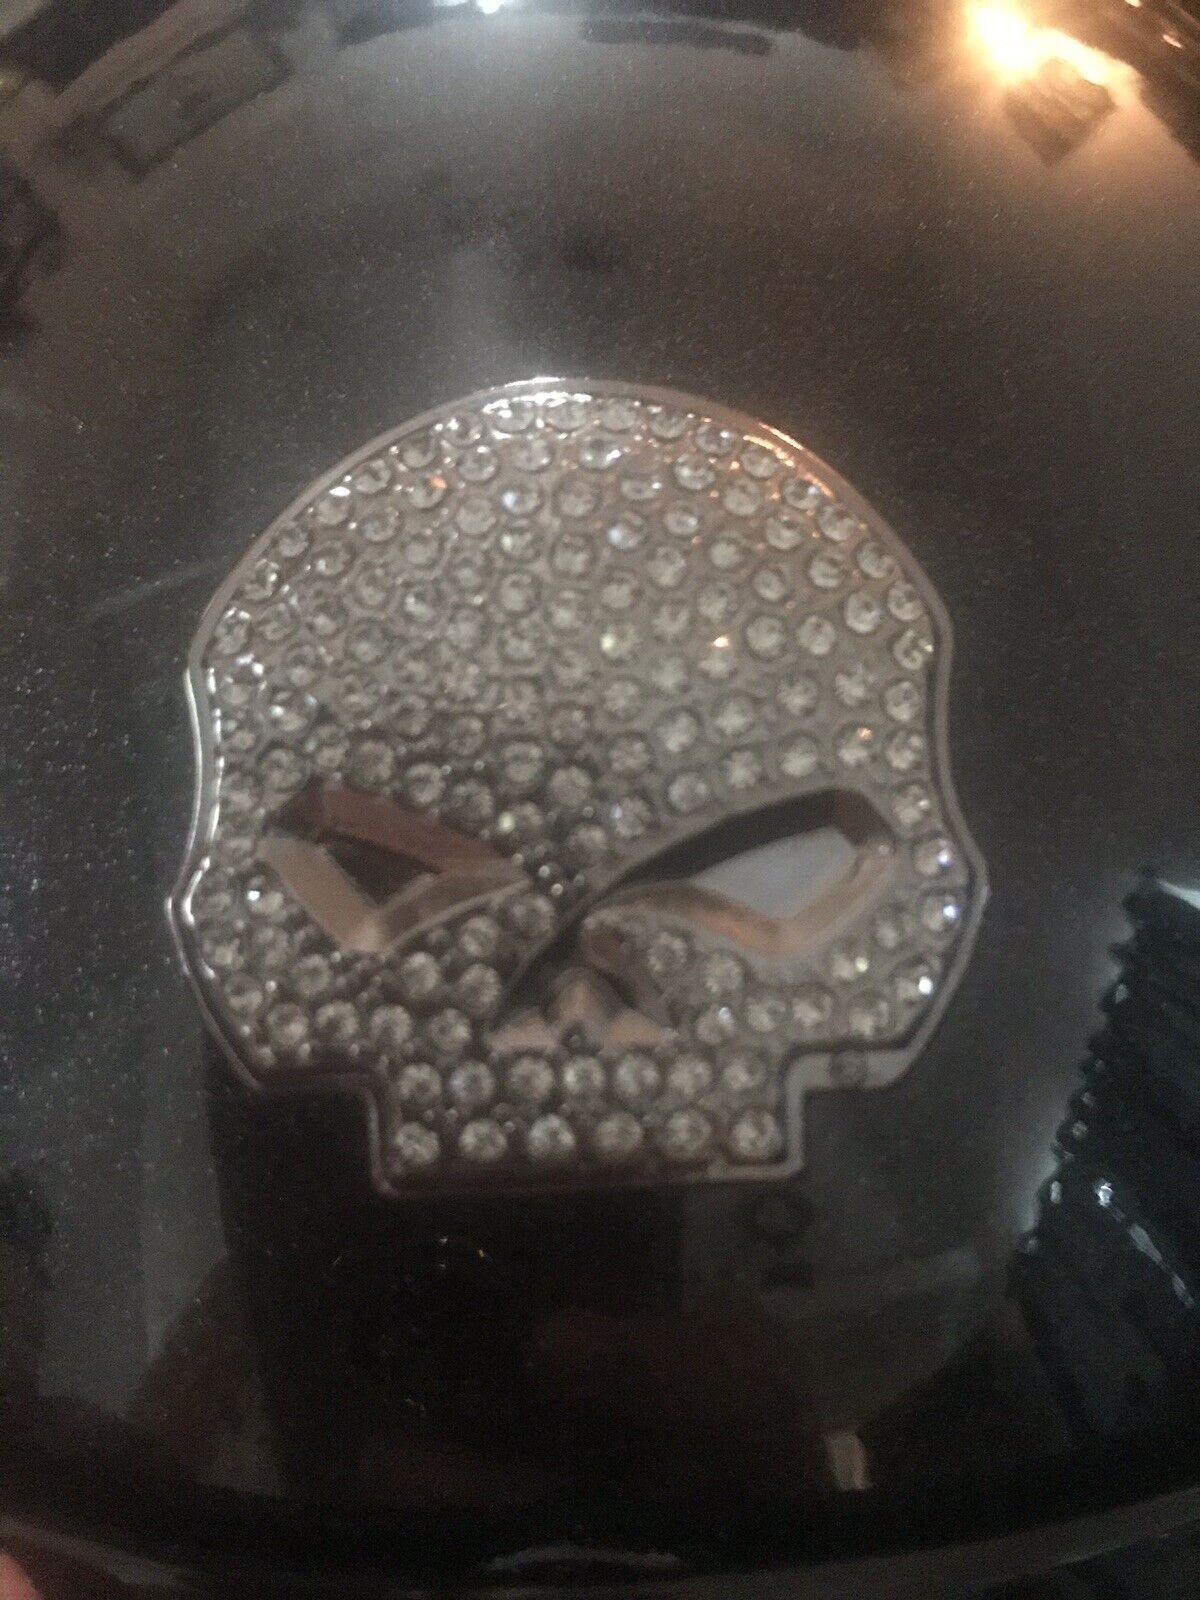 donna Sm Harley Davidson Metallic  Crystal Skull Helmet Hybrid Classic Cruiser